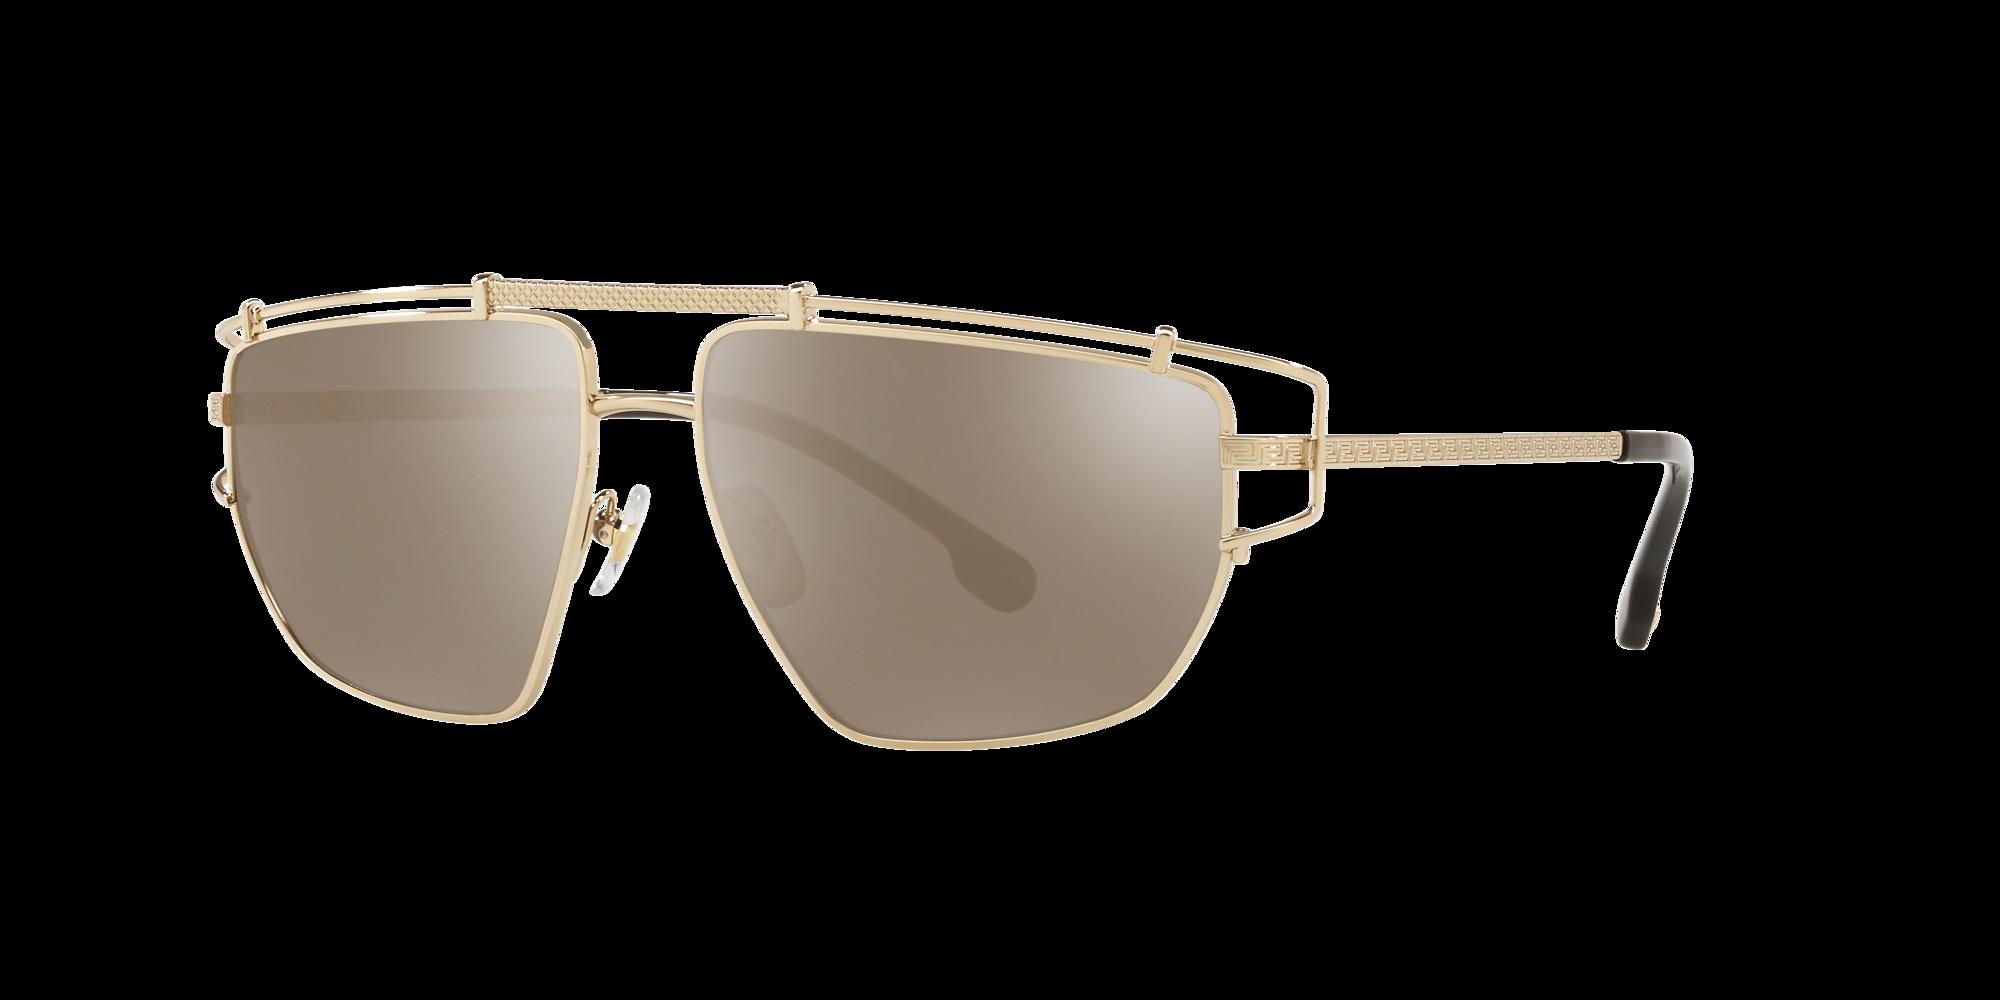 Versace Unisex  VE2202 -  Frame color: Oro, Lens color: Oro, Size 57-14/140